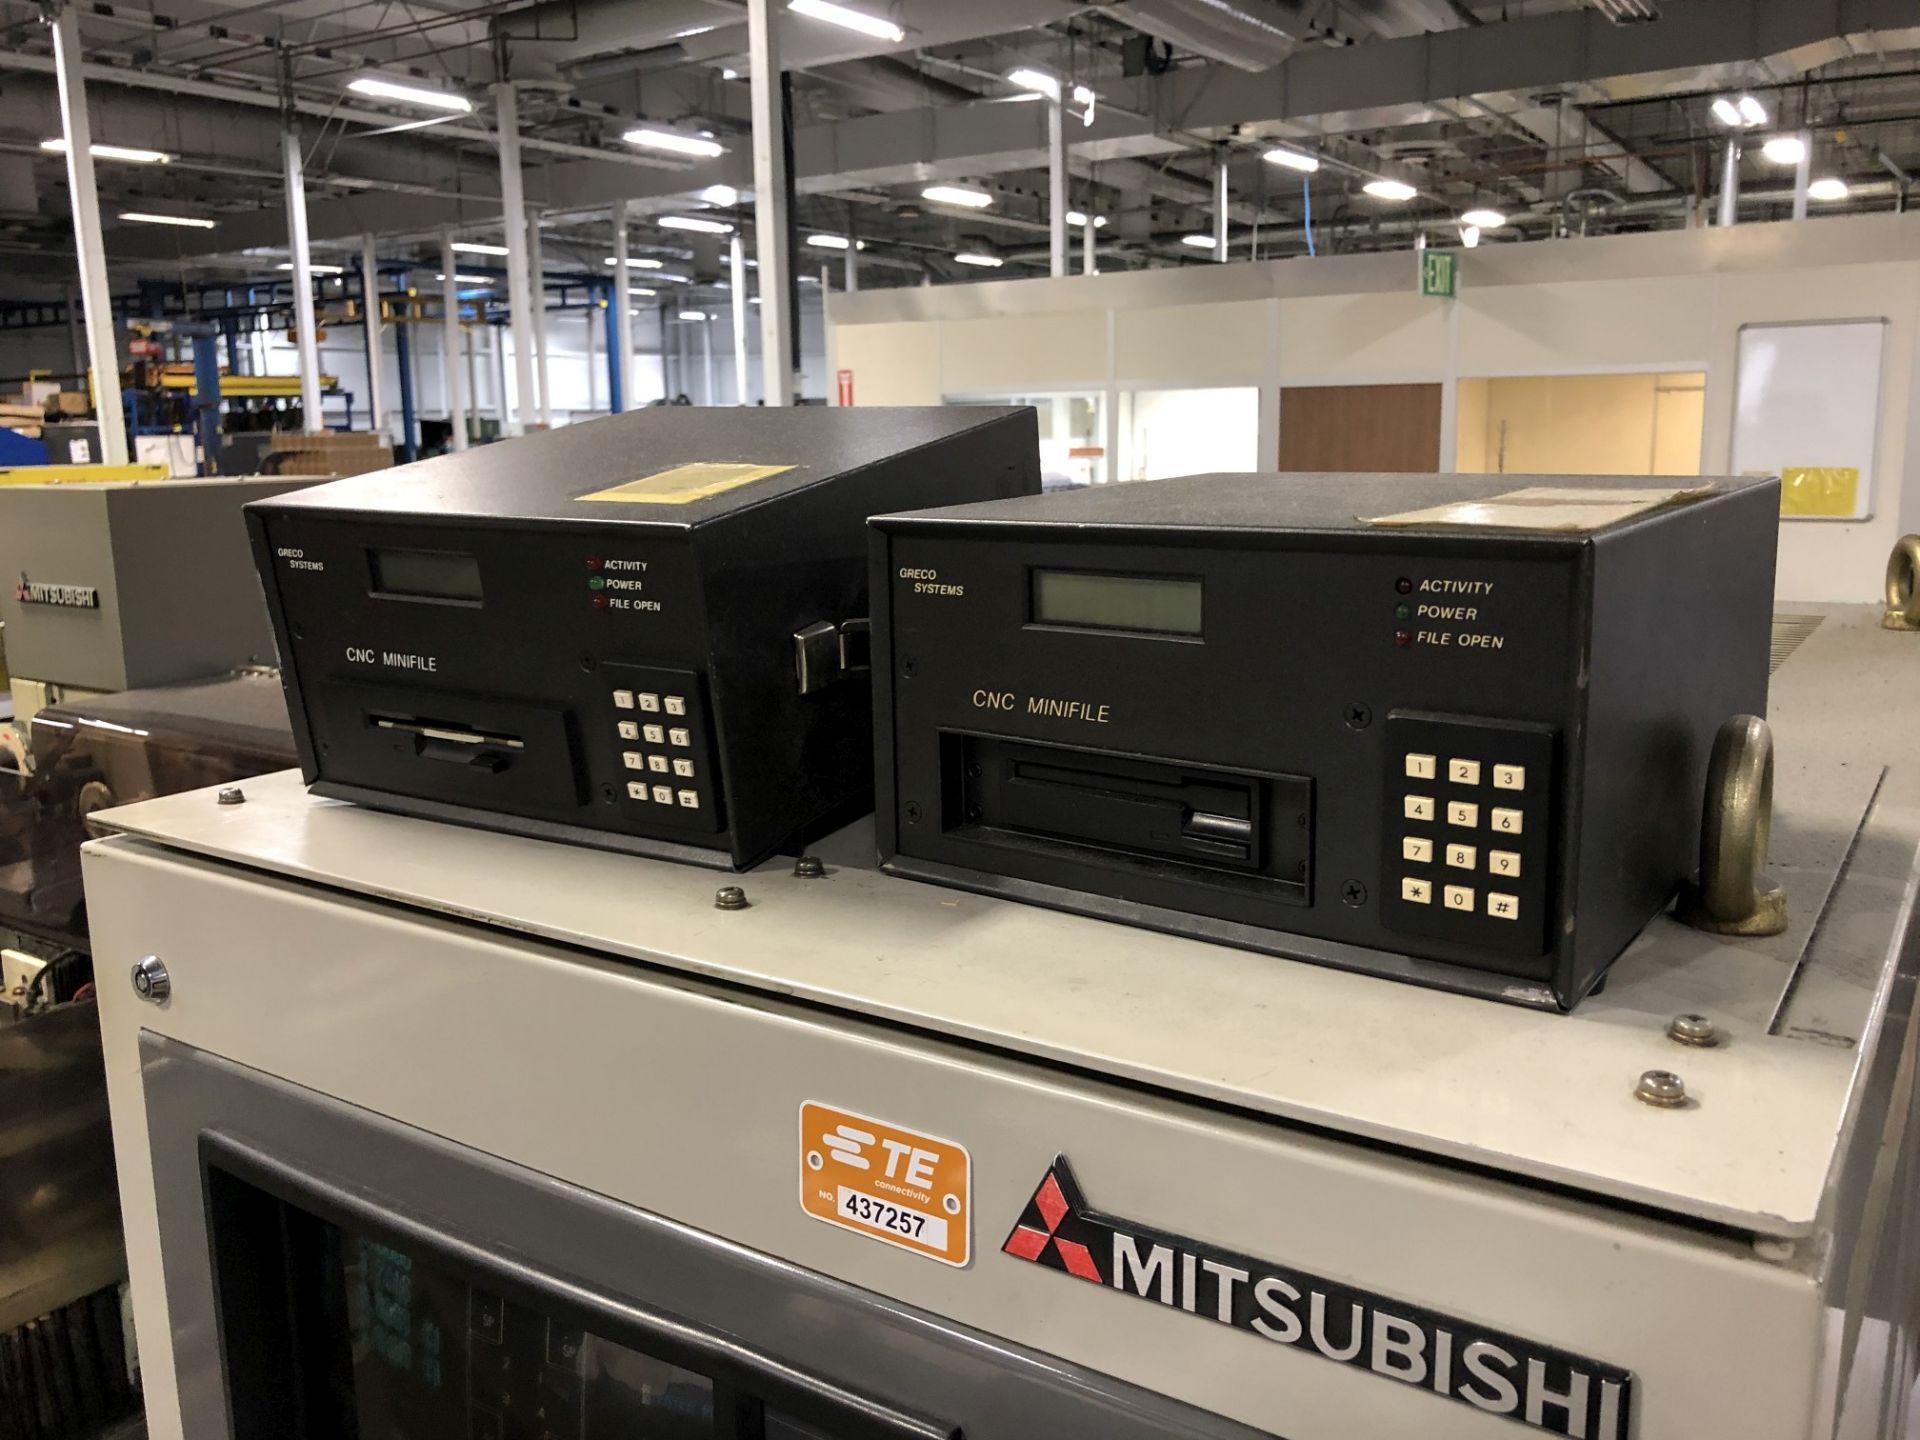 1988 Mitsubishi DWC90H CNC Wire EDM - Image 7 of 13